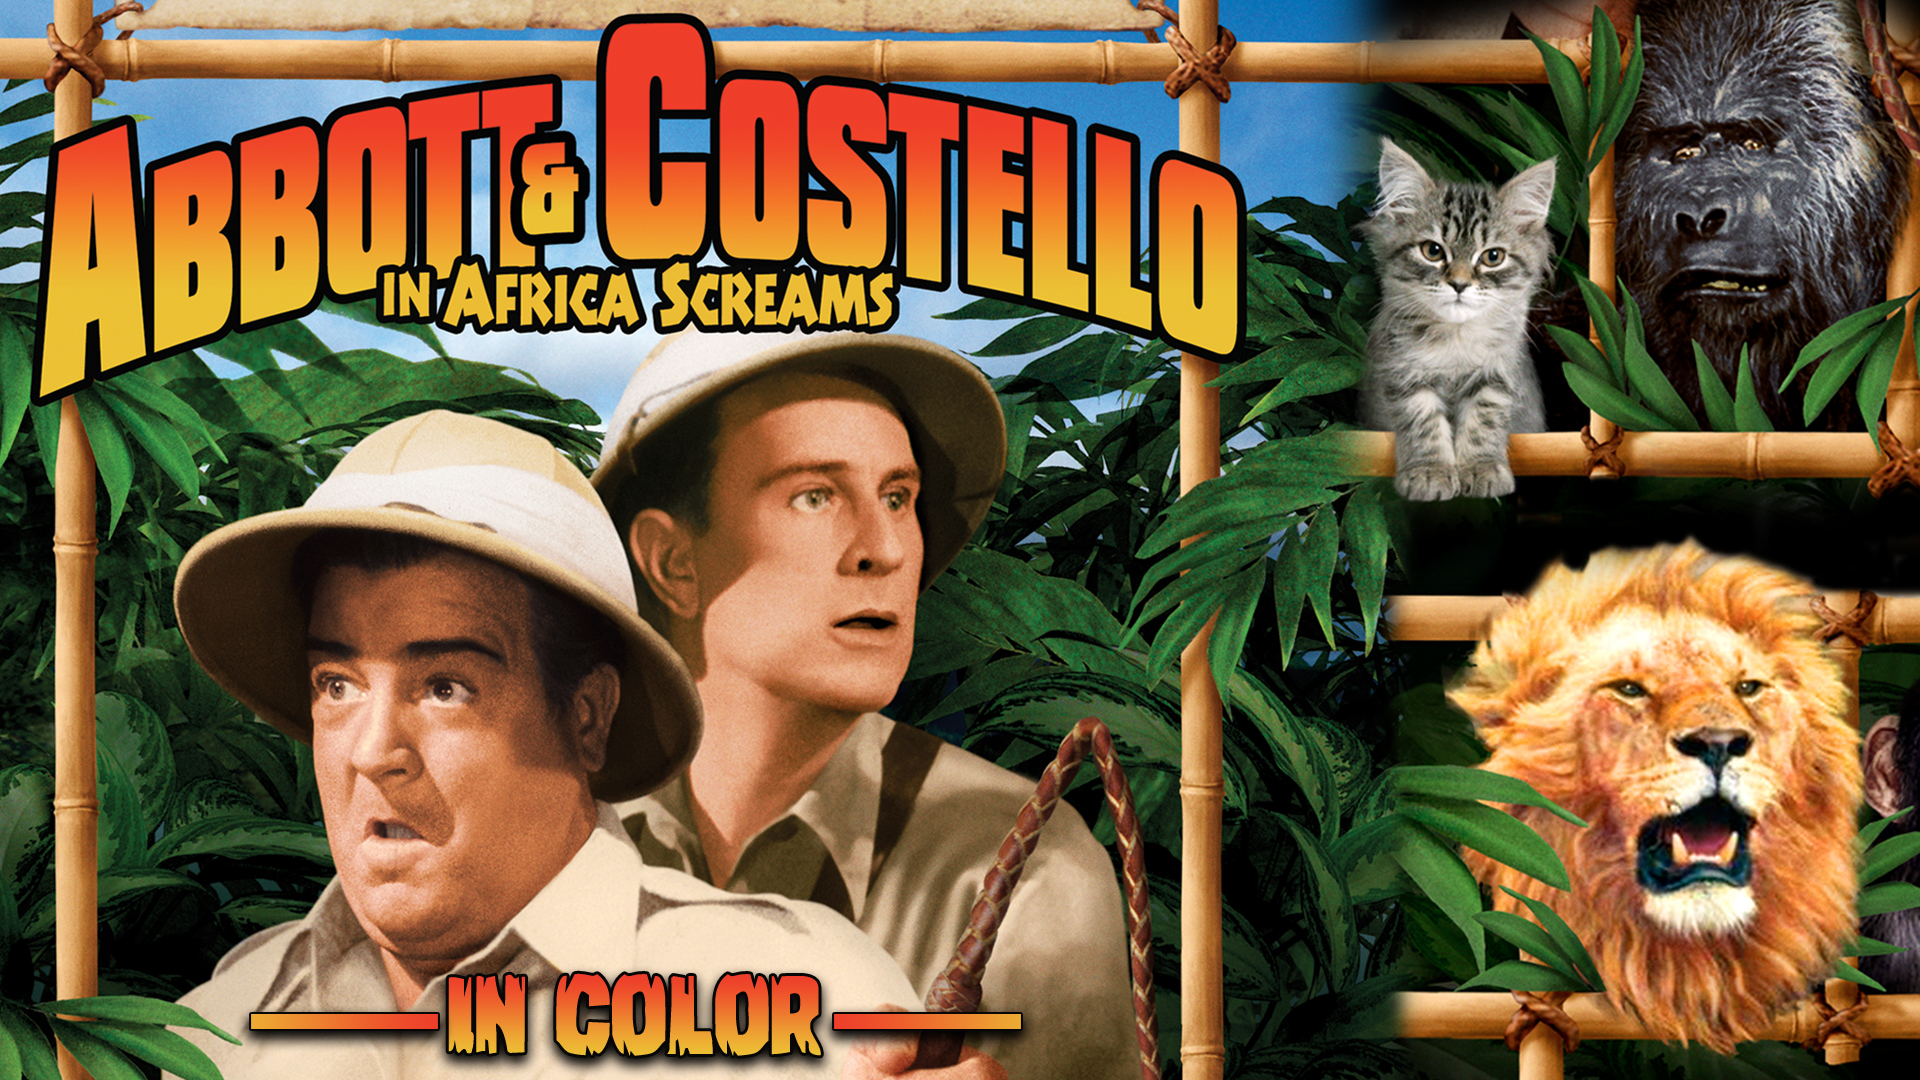 Abbott & Costello in Africa Screams (In Color)